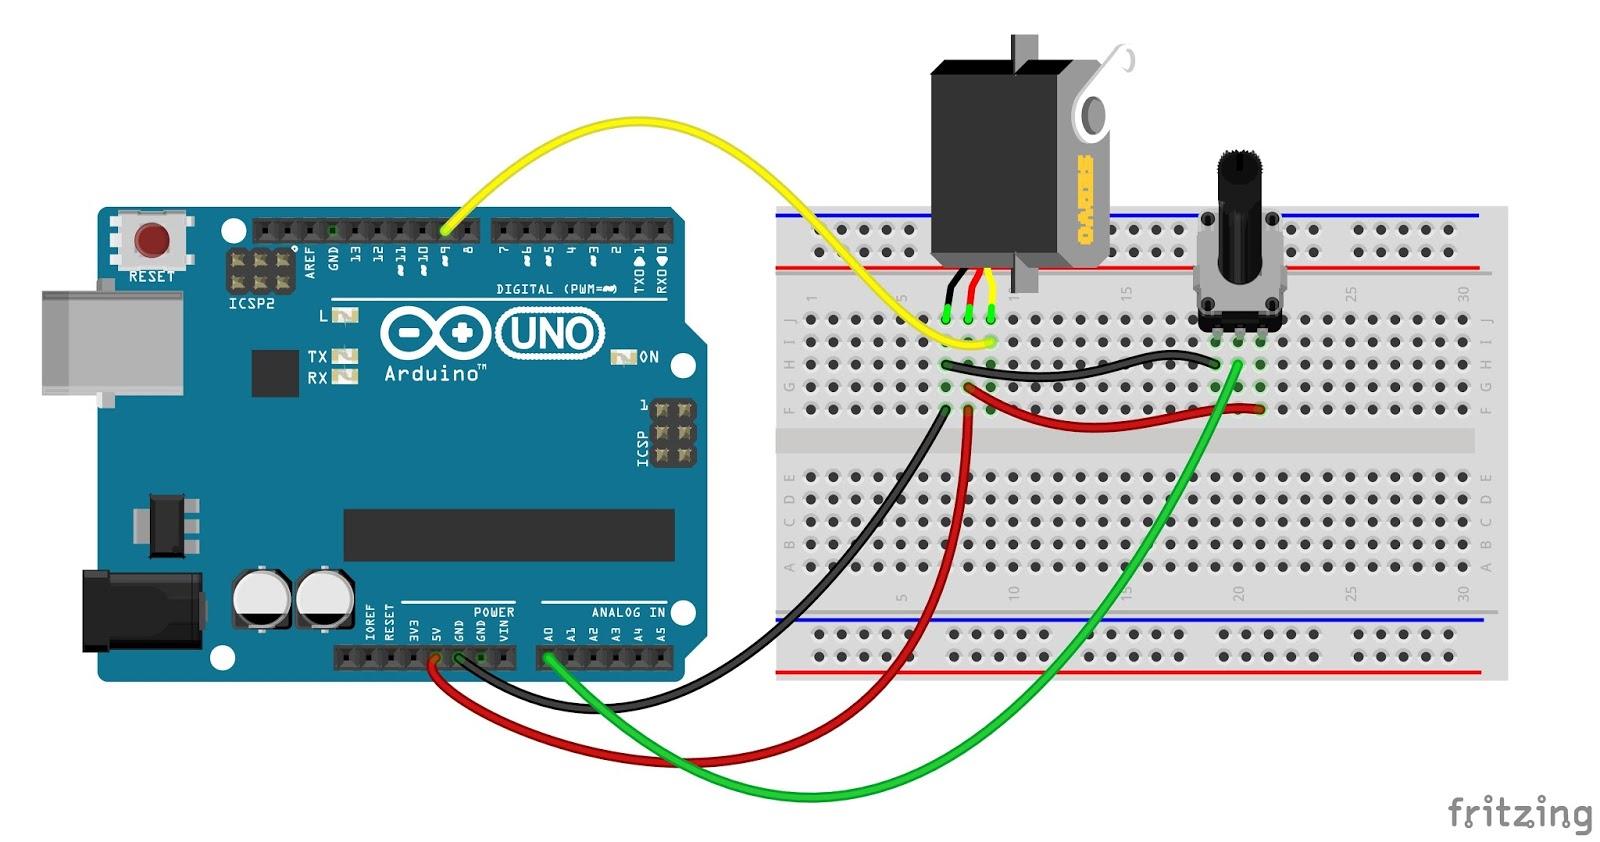 medium resolution of arduino stepper motor driver circuit diagram with arduino mach3 cnc board wiring diagram cnc machine diagram